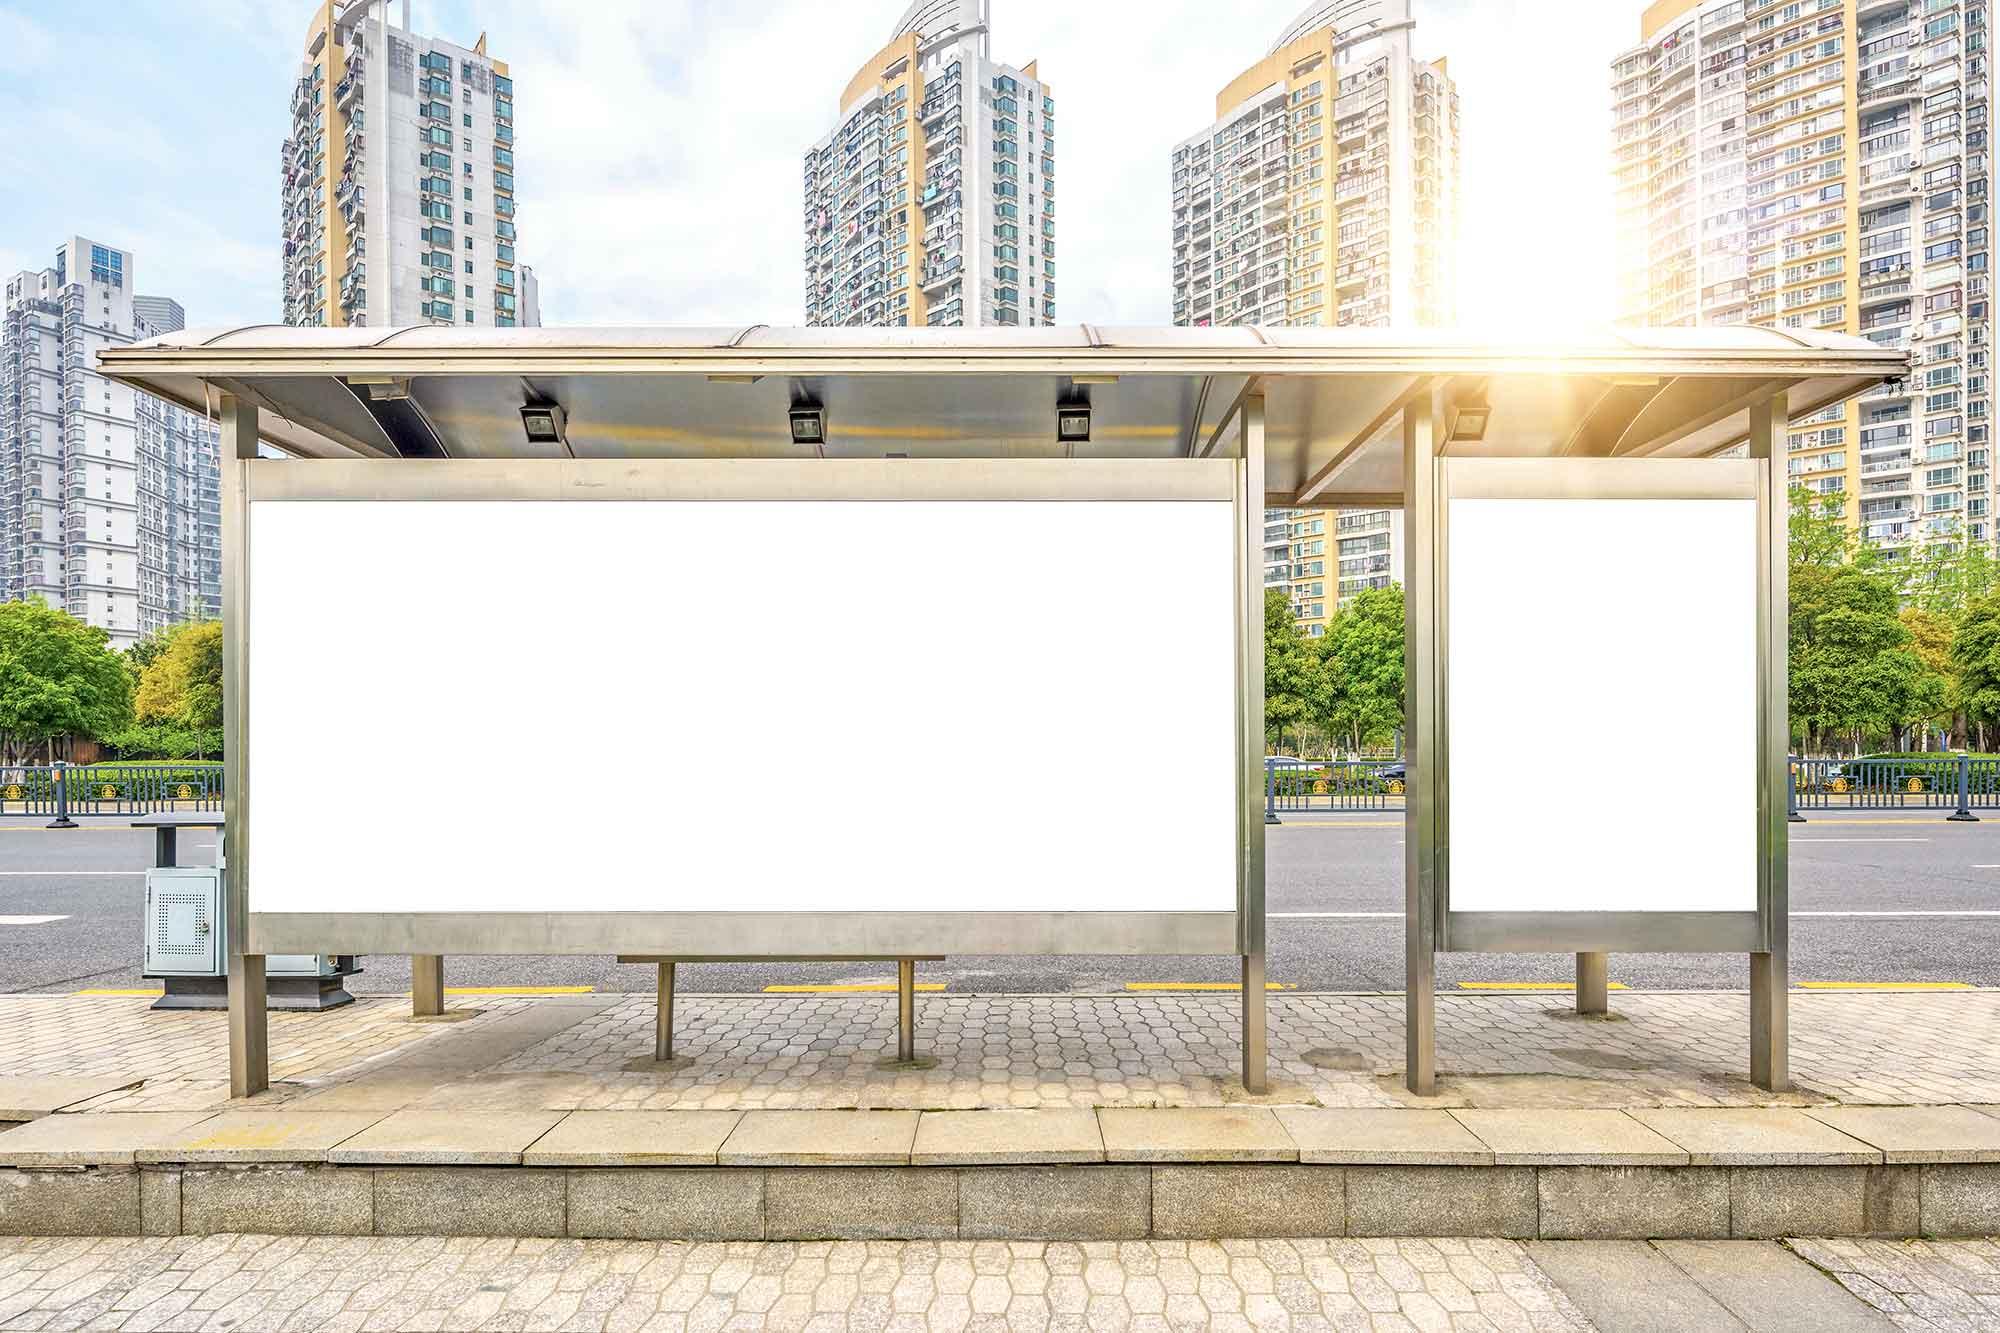 Bus Stop Billboards Mockup 2